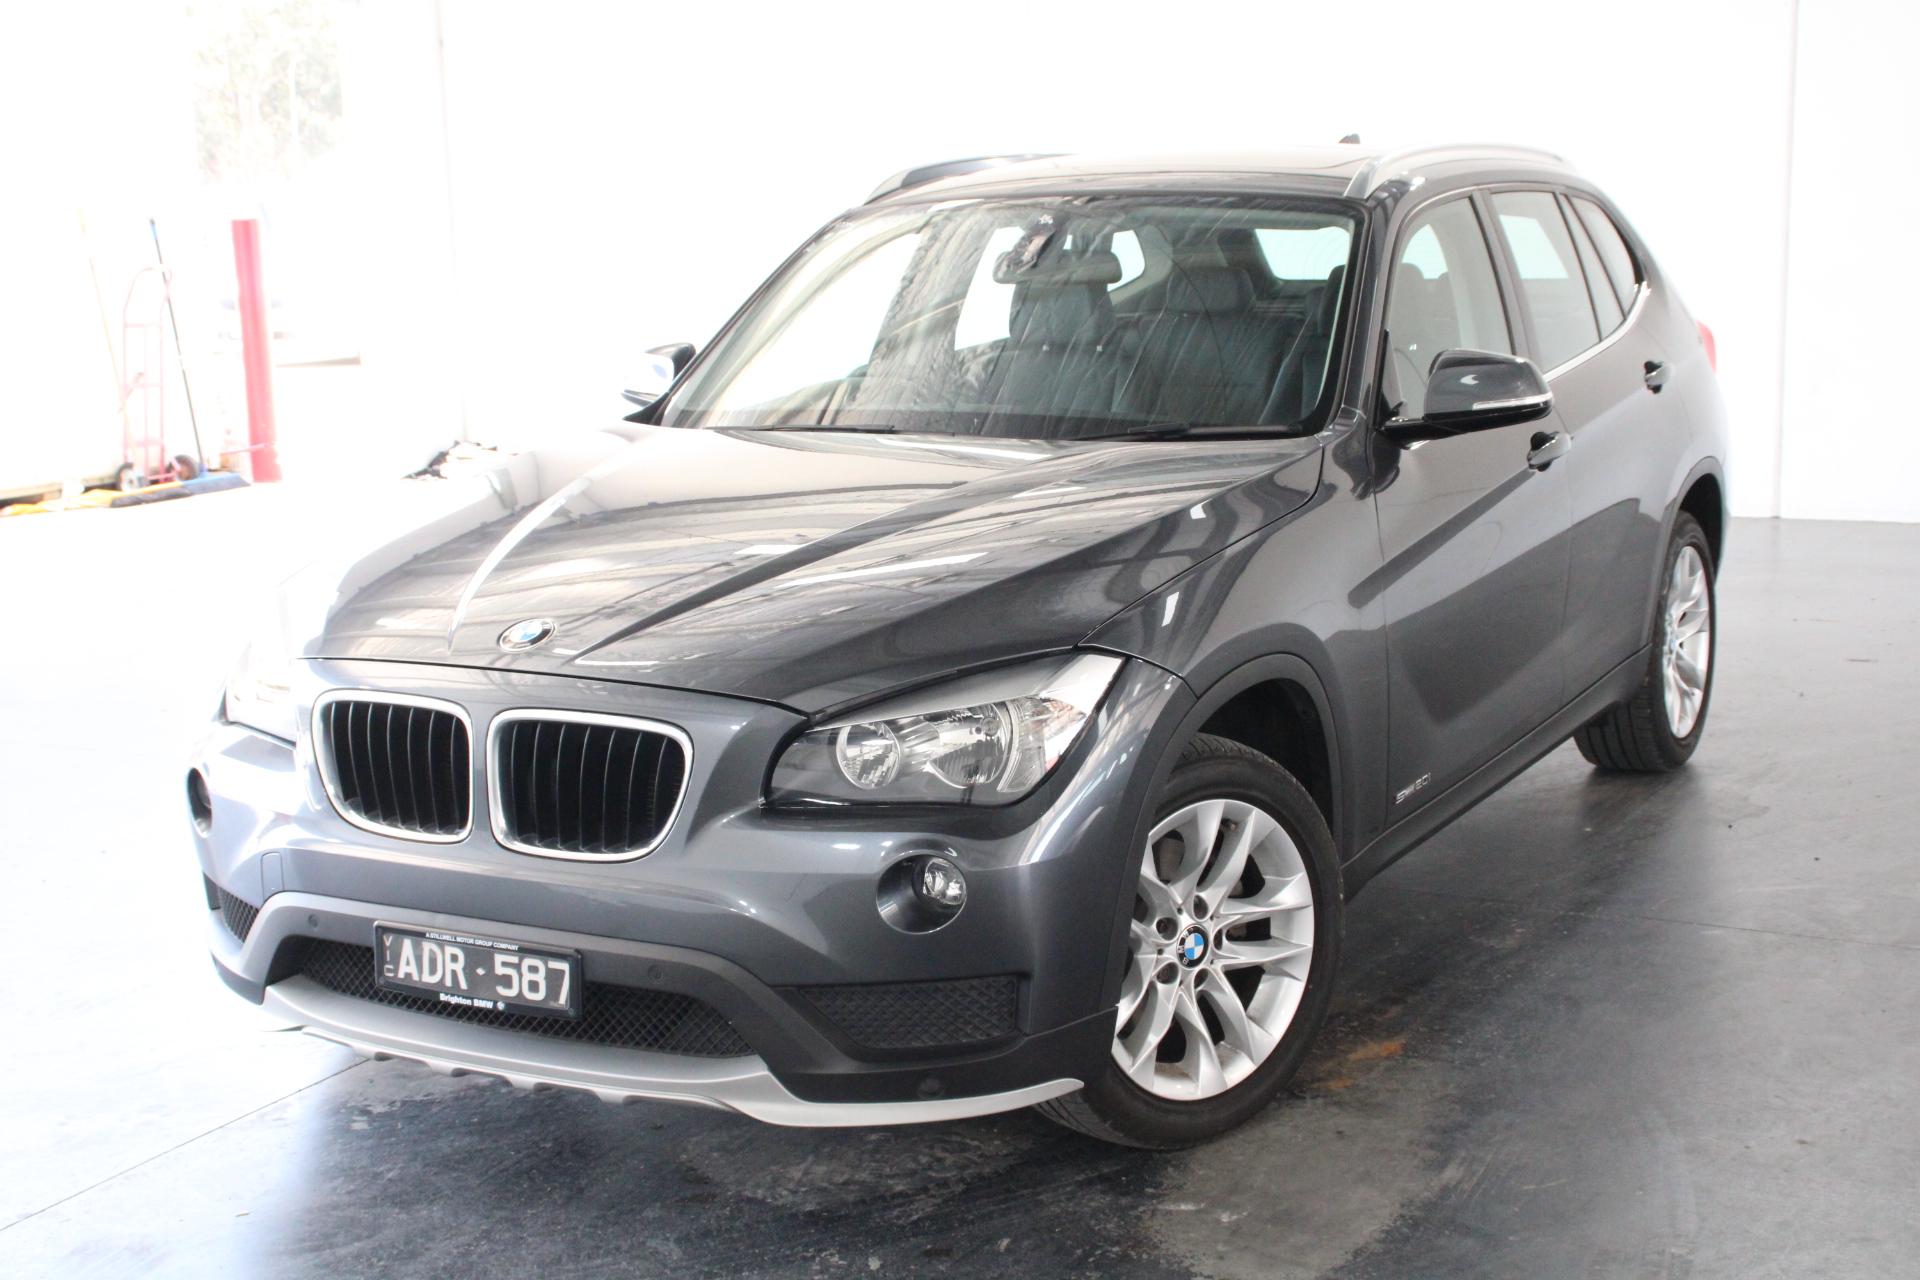 2015 BMW X1 sDrive 20i E84 LCI Automatic - 8 Speed Wagon